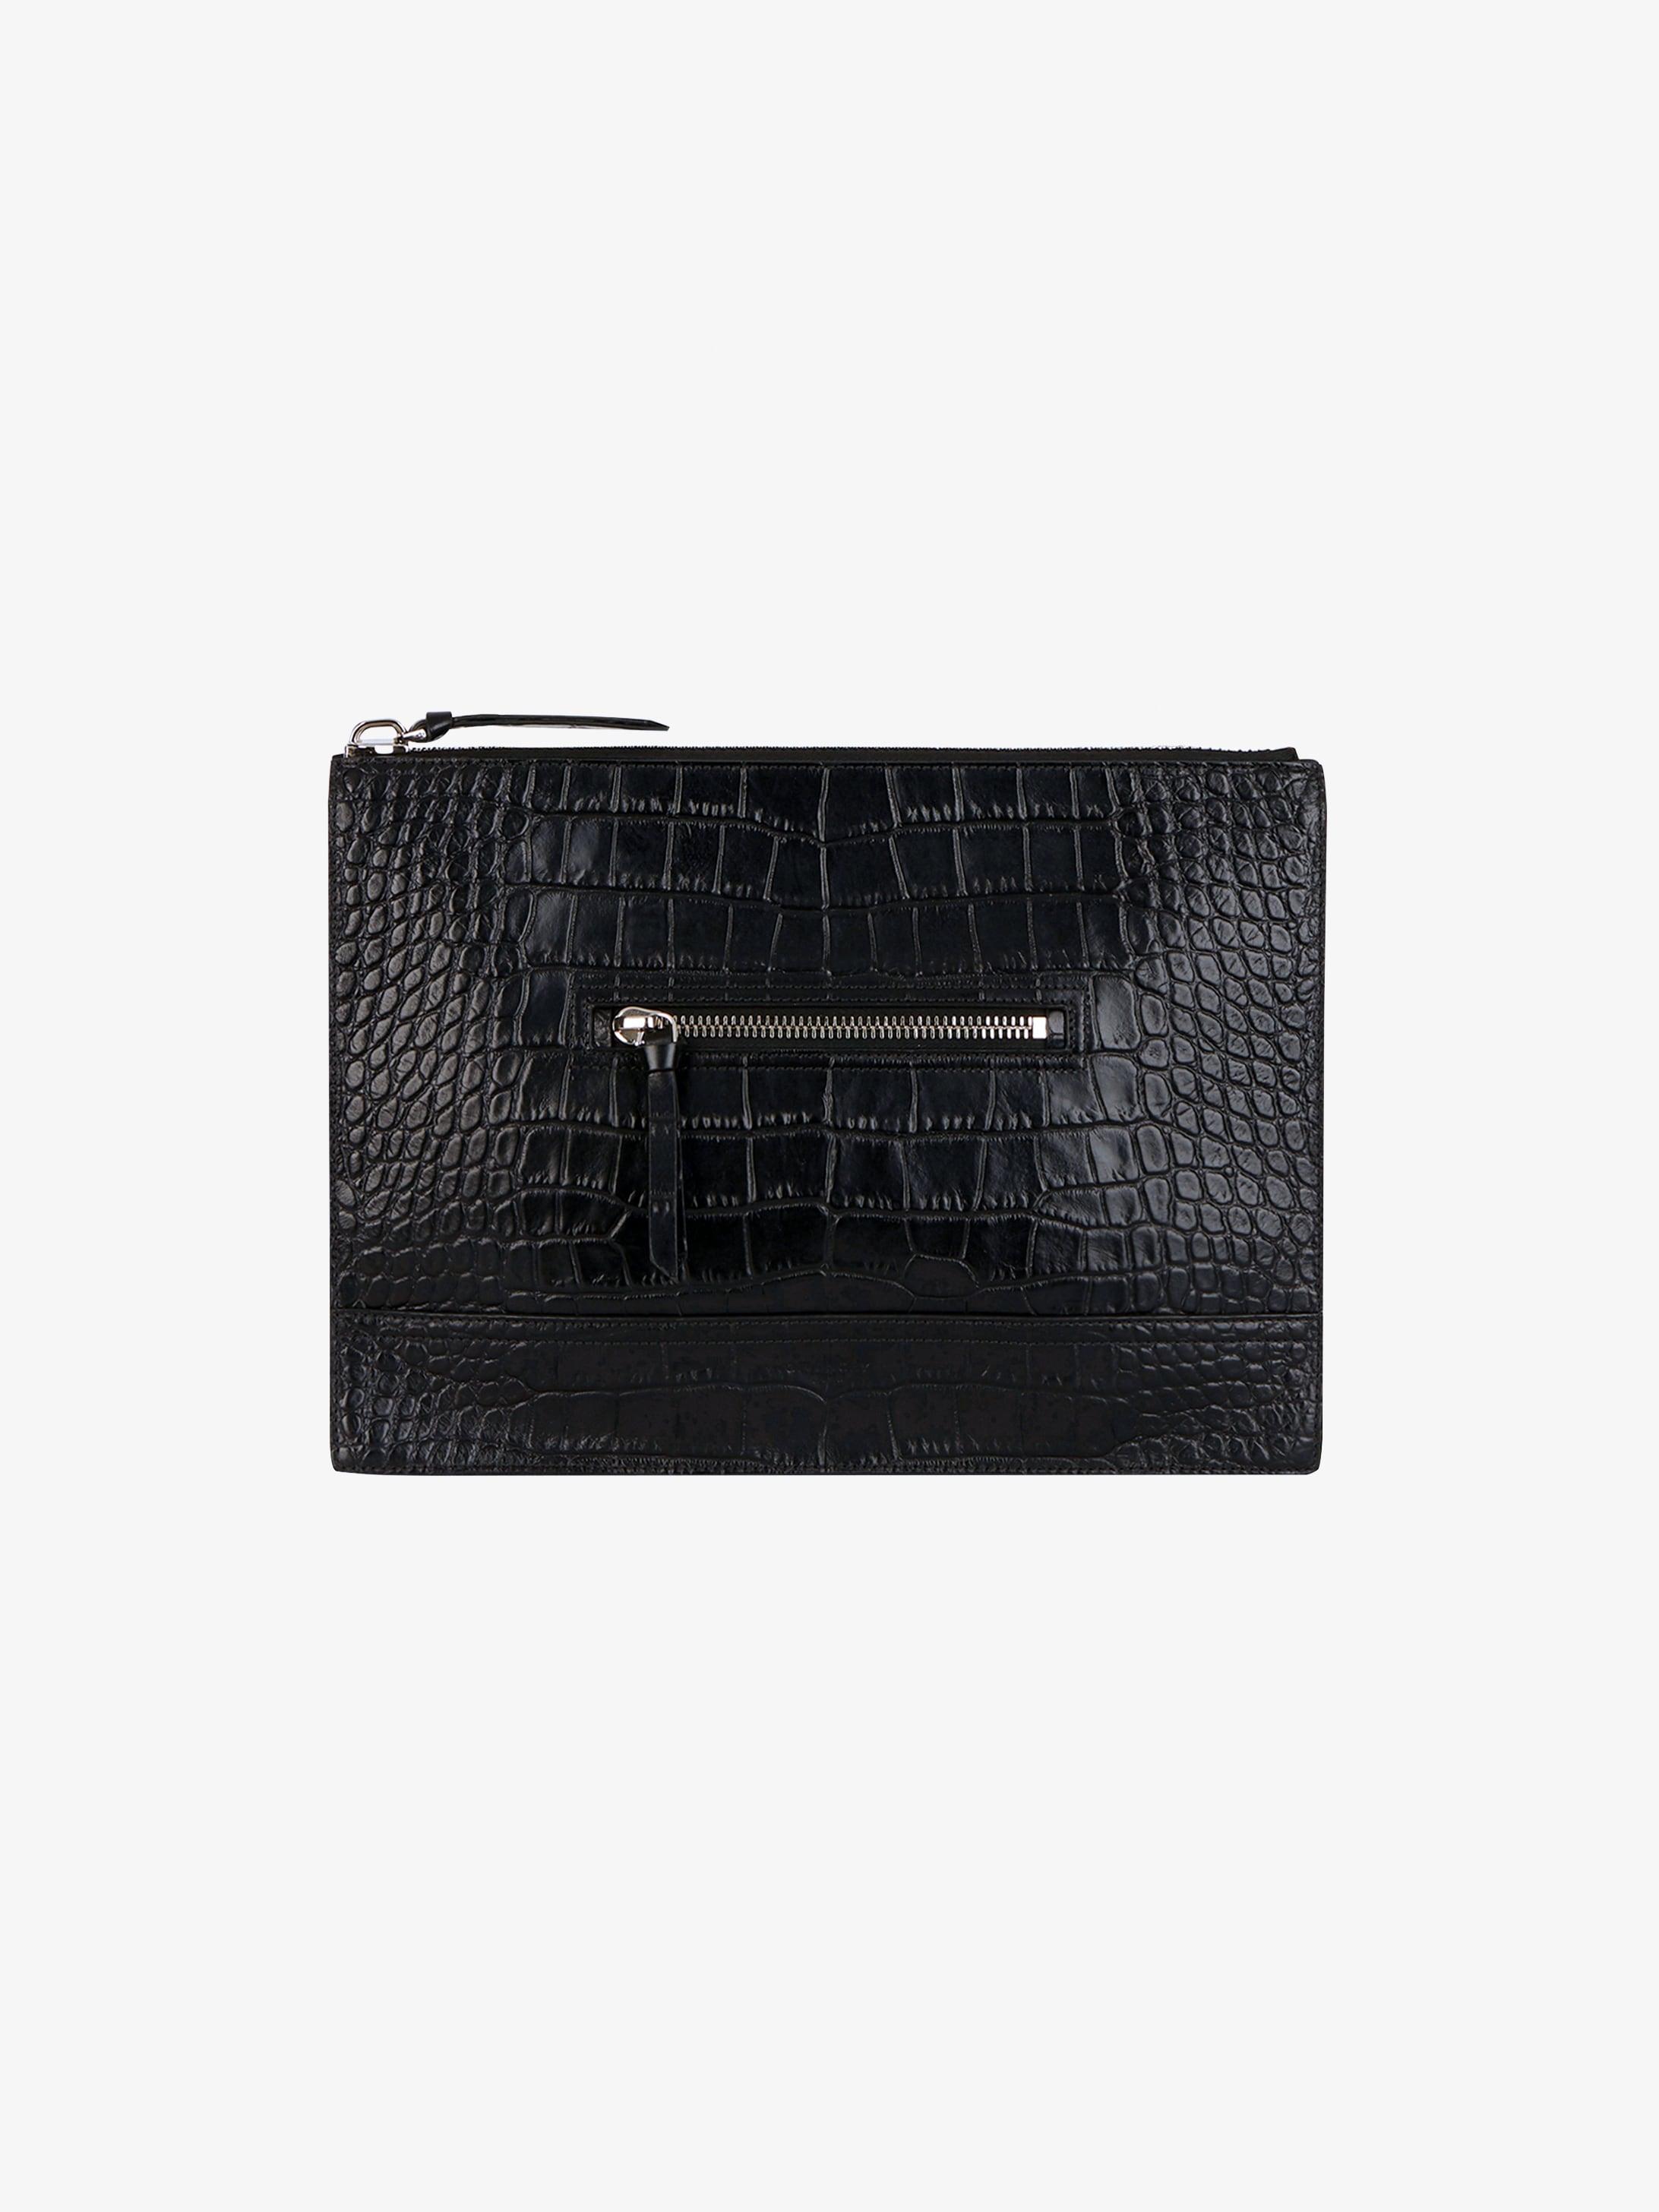 Crocodile embossed flat Pandora messenger bag